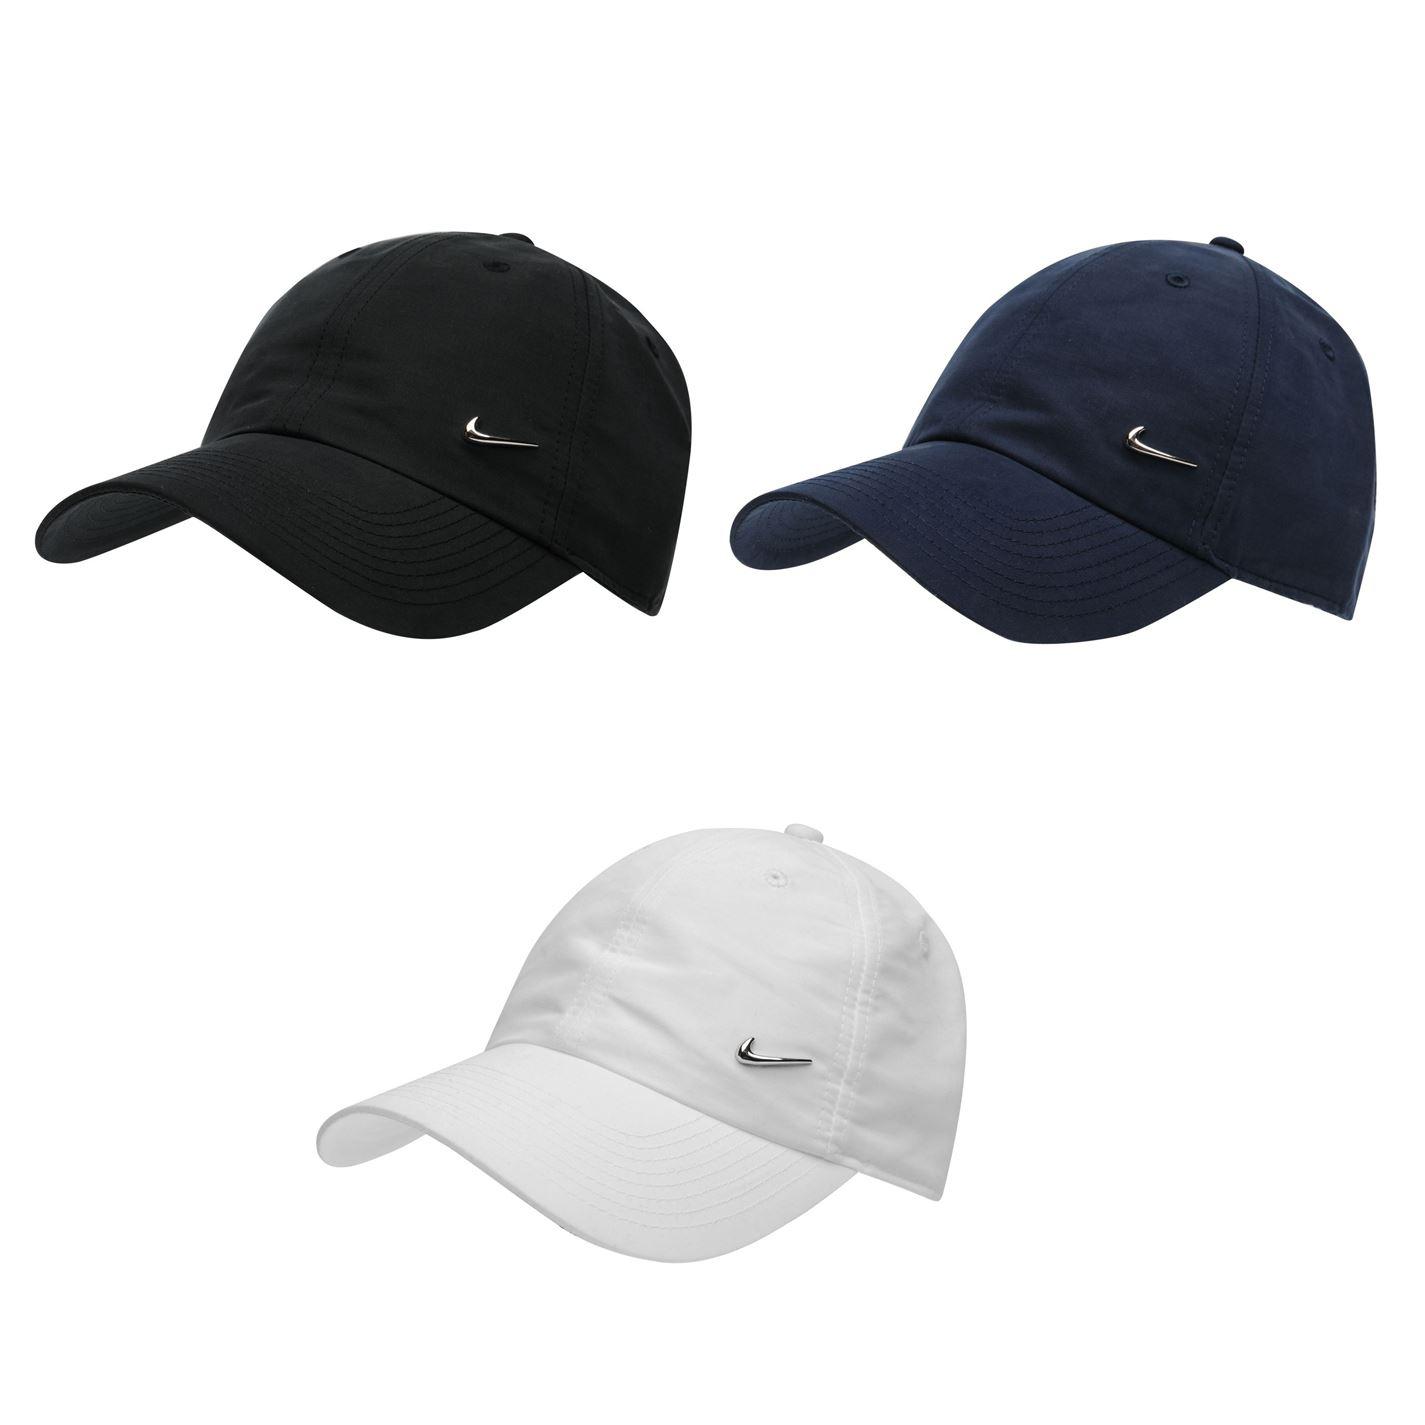 the best attitude d5c4f 31fab Details about Nike Metal Swoosh Cap Mens Baseball Hat Headwear